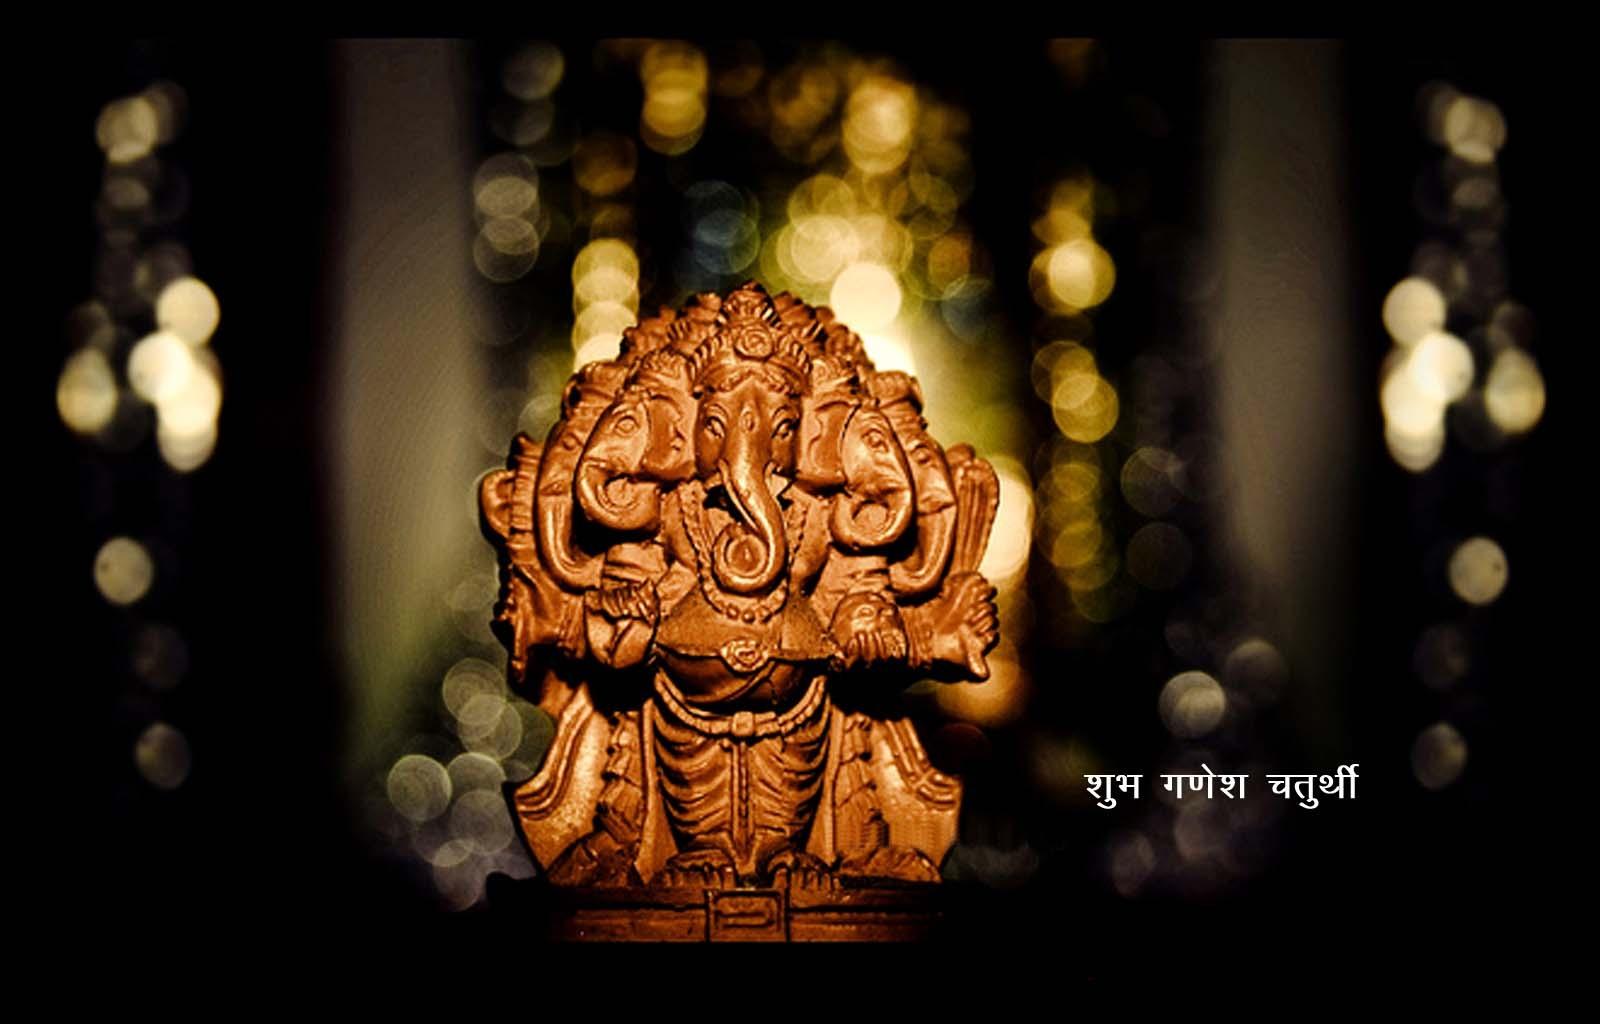 2019 Shri Ganesh Wallpaper Hd Best 2019 Collection Festivals On Web